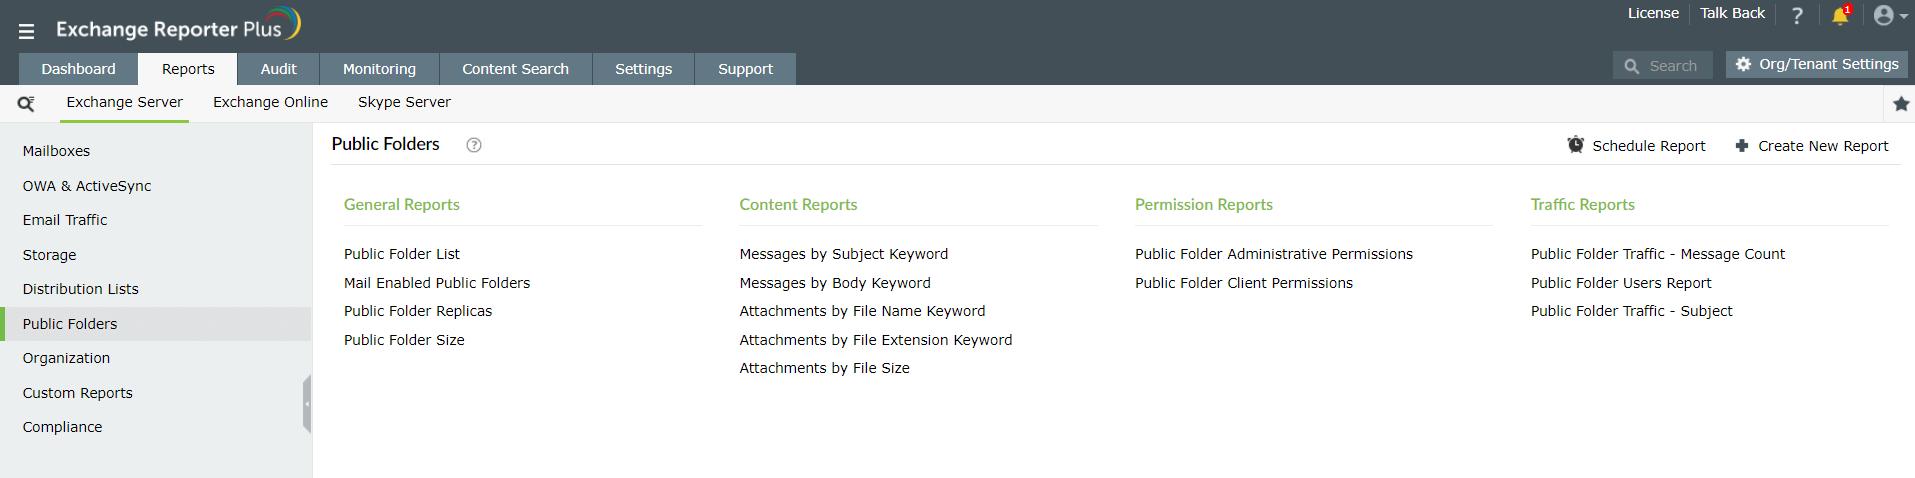 Export public folder lists using Exchange Reporter Plus